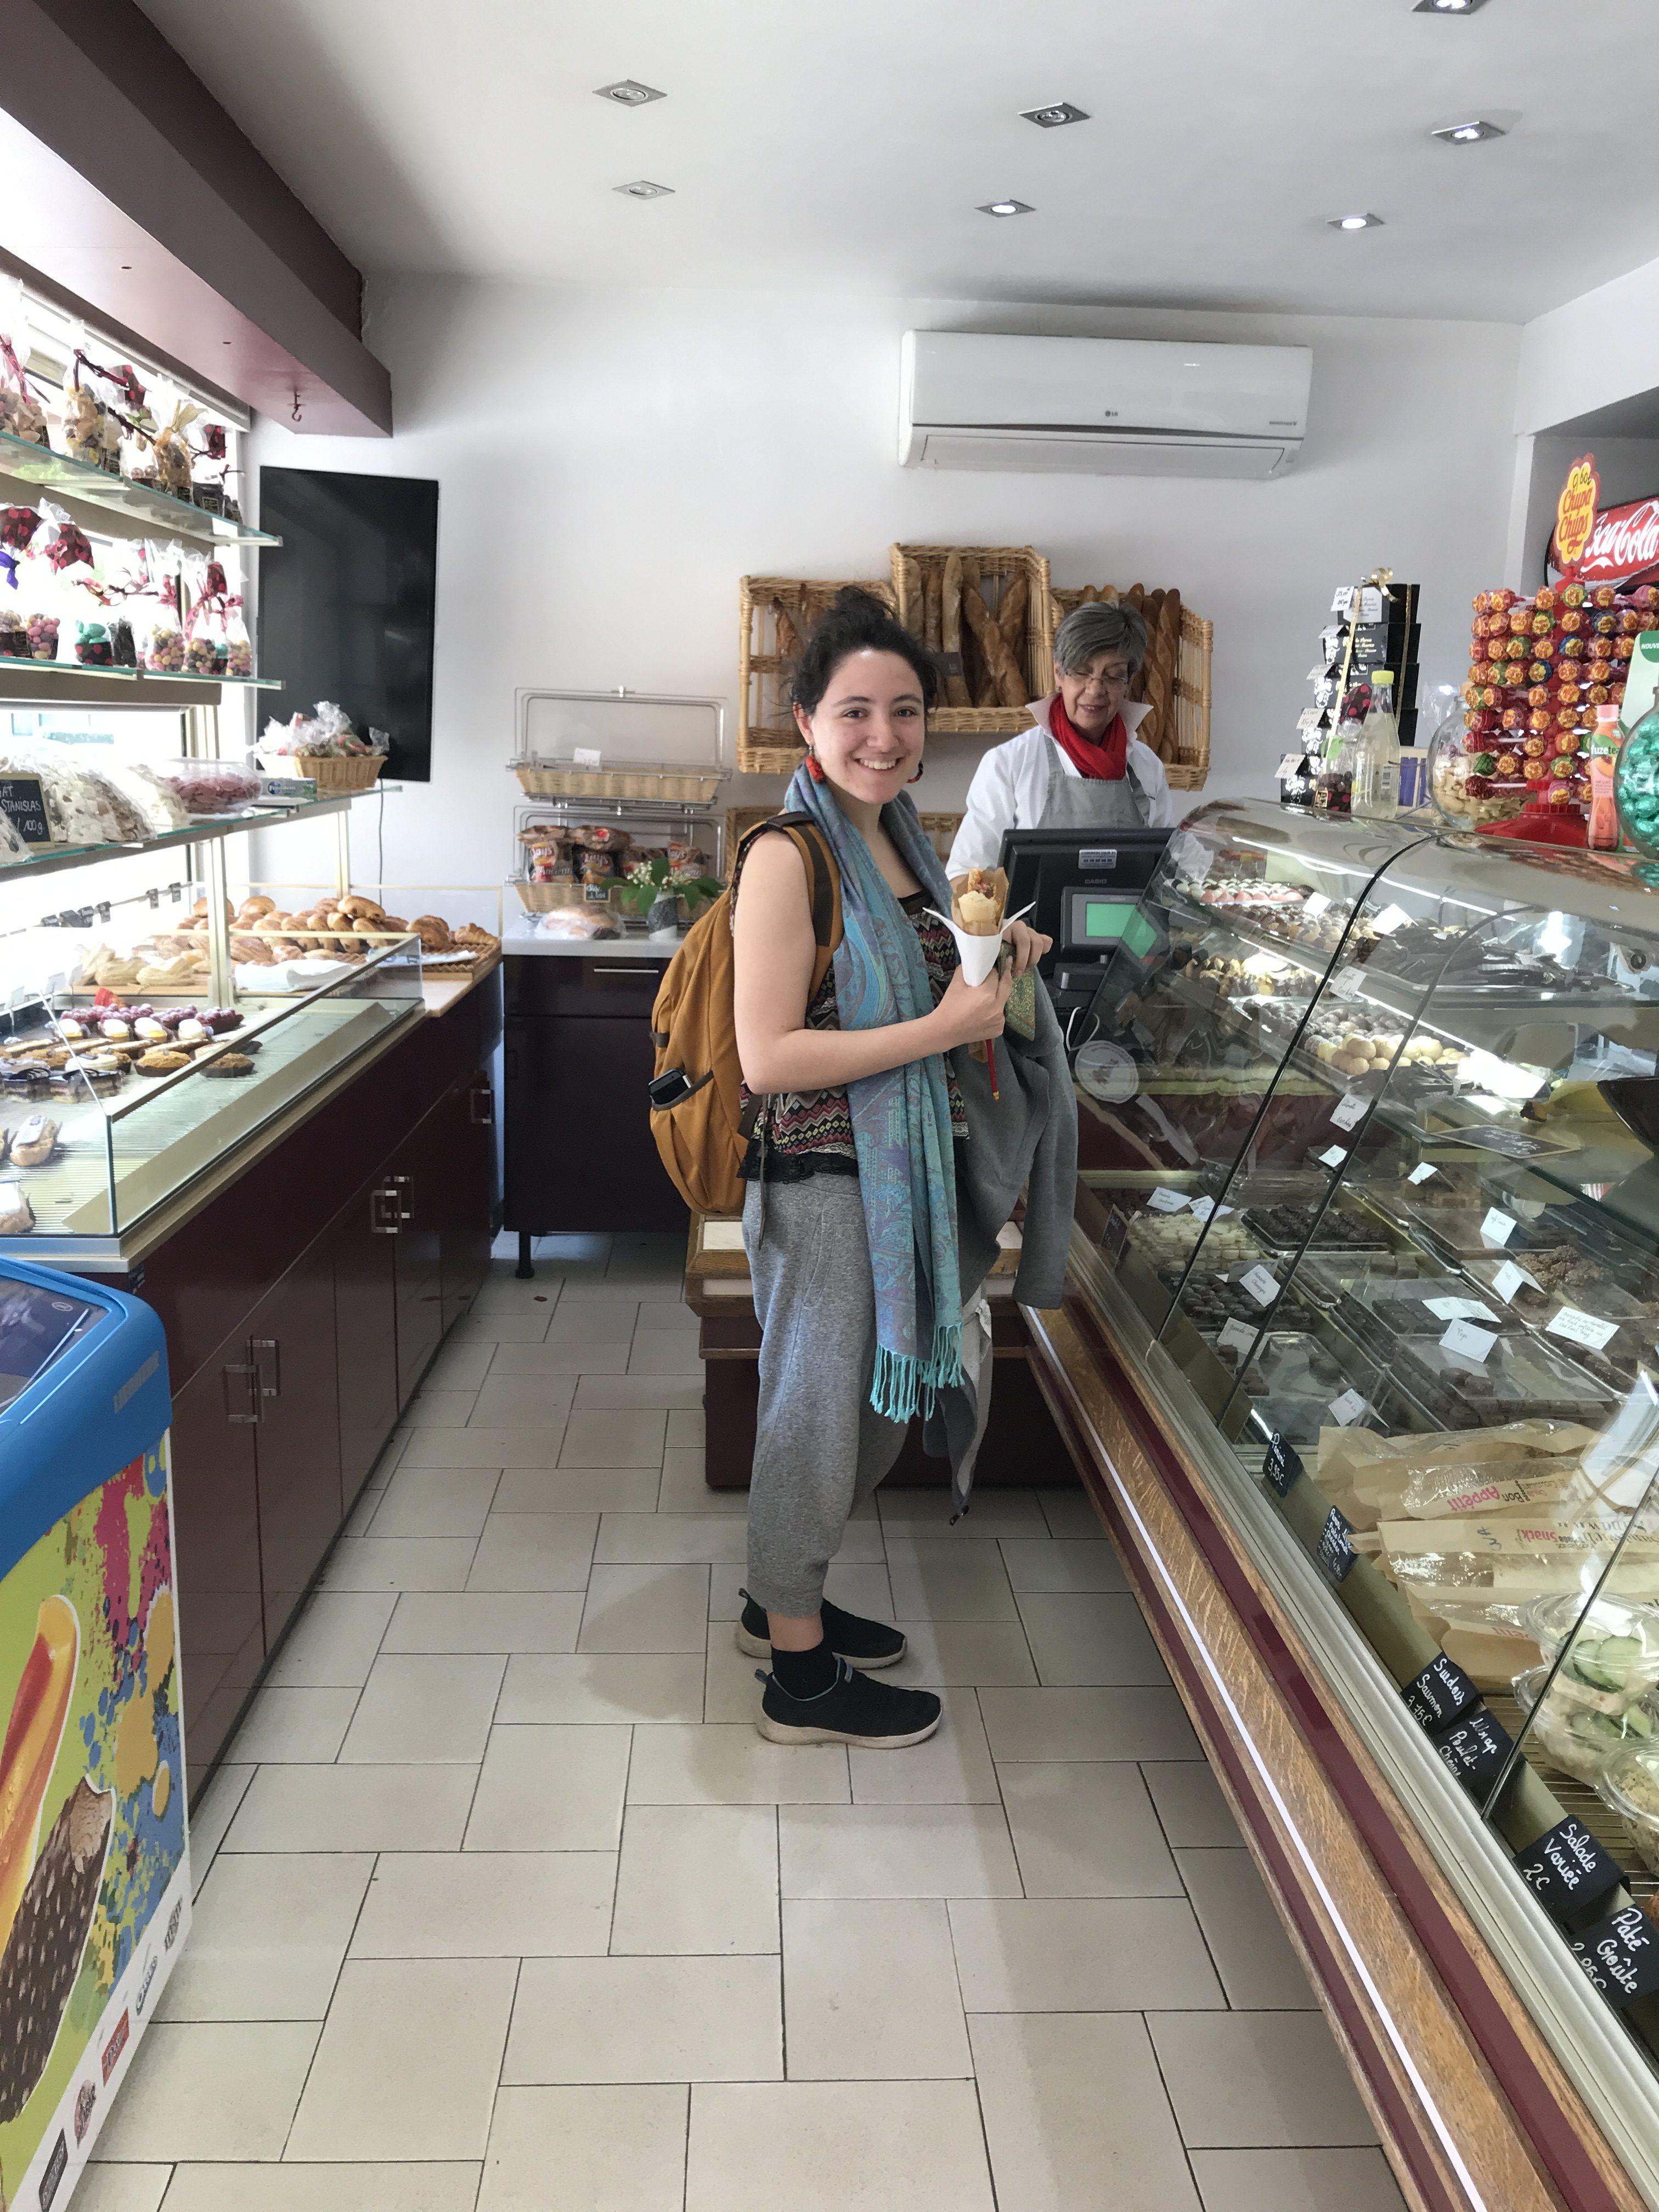 In the boulangerie